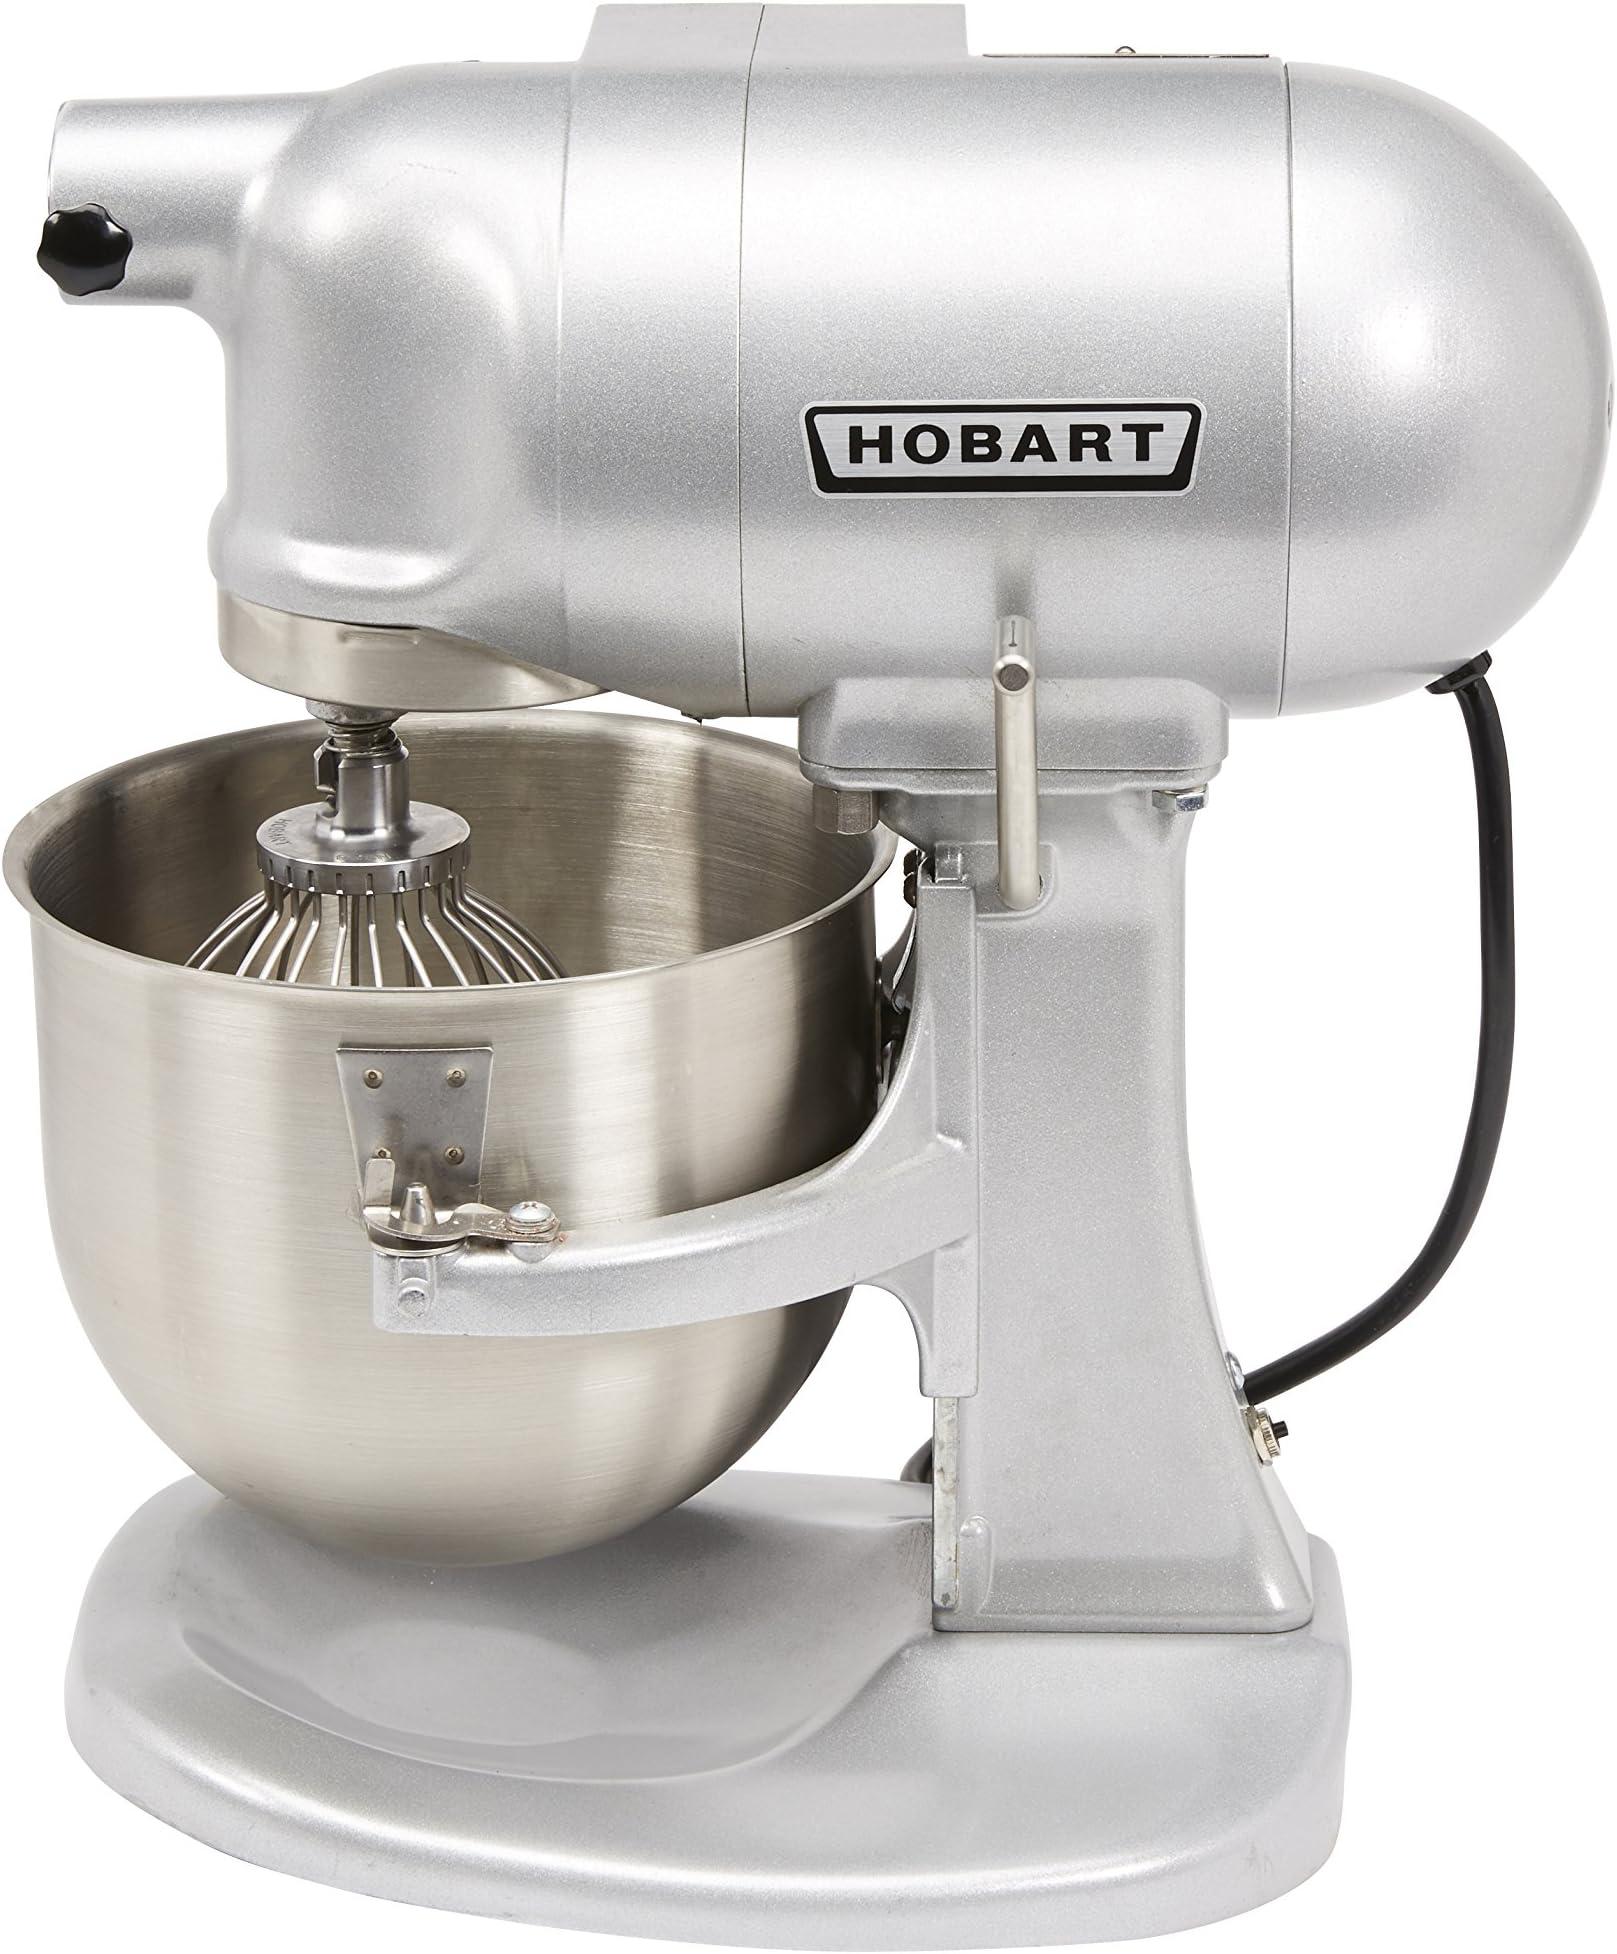 Hobart N50-60 5-Quart Commercial Countertop Mixer, Gear-Driven, 3-Speed, Gray